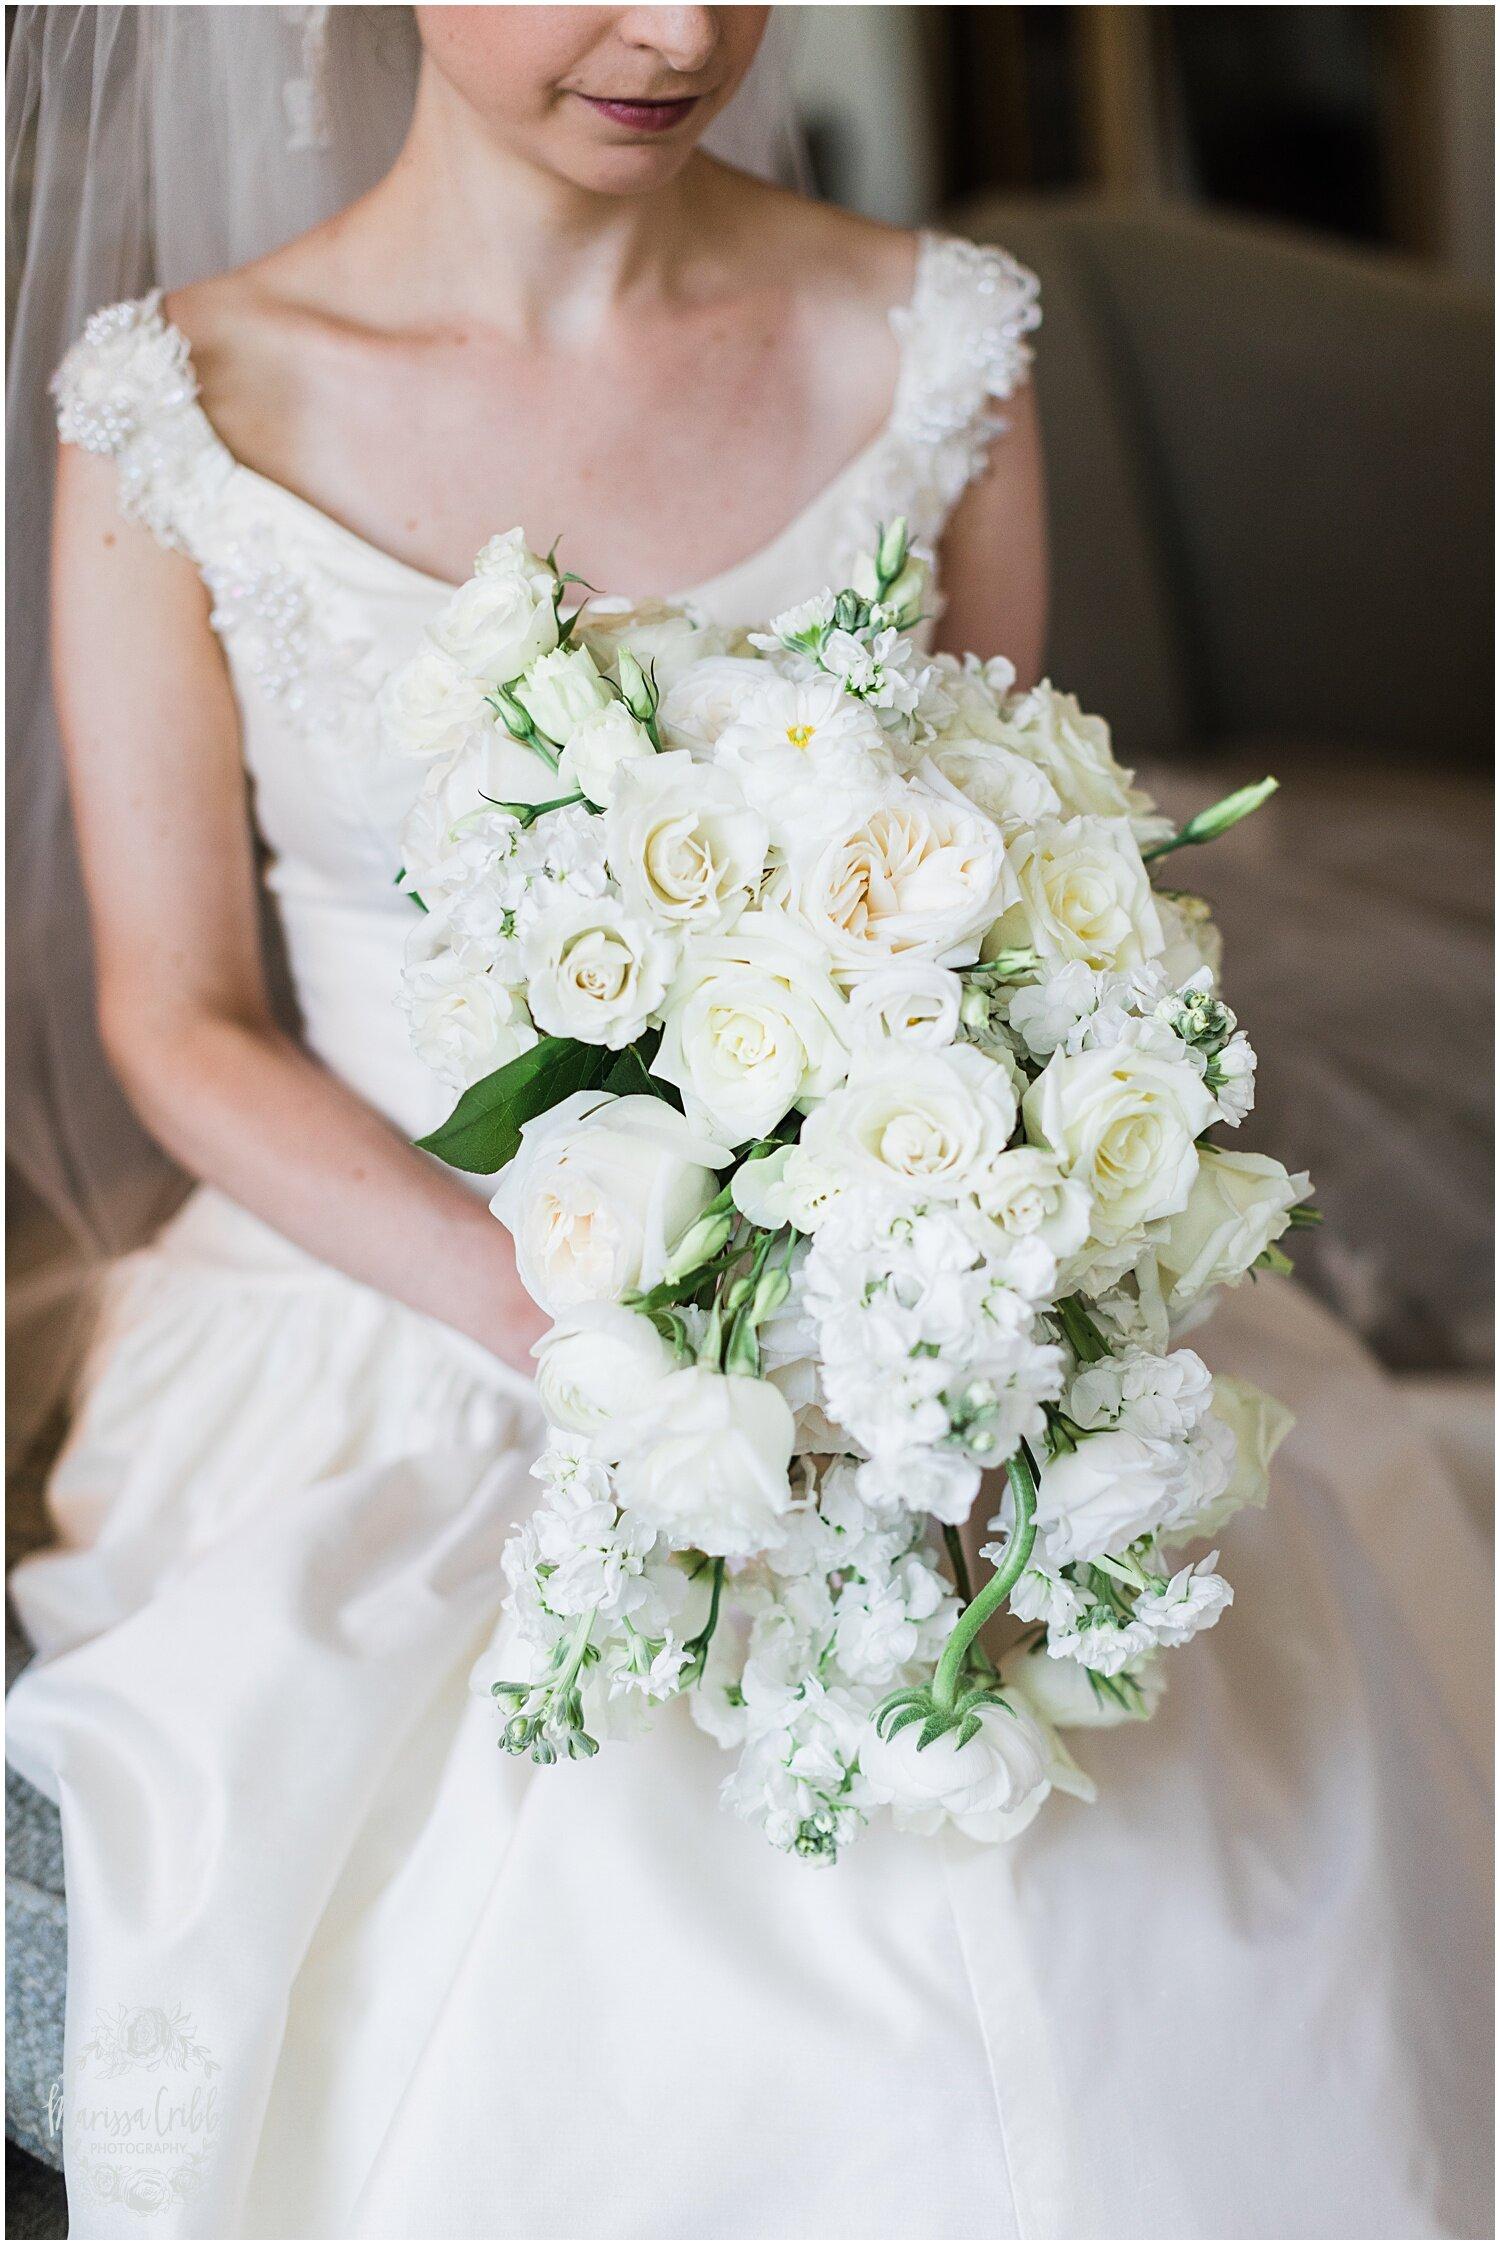 TYLER & CAROLINE MARRIED BLOG | MARISSA CRIBBS PHOTOGRAPHY | THE CARRIAGE CLUB | KANSAS CITY WEDDING PHOTOS_9215.jpg